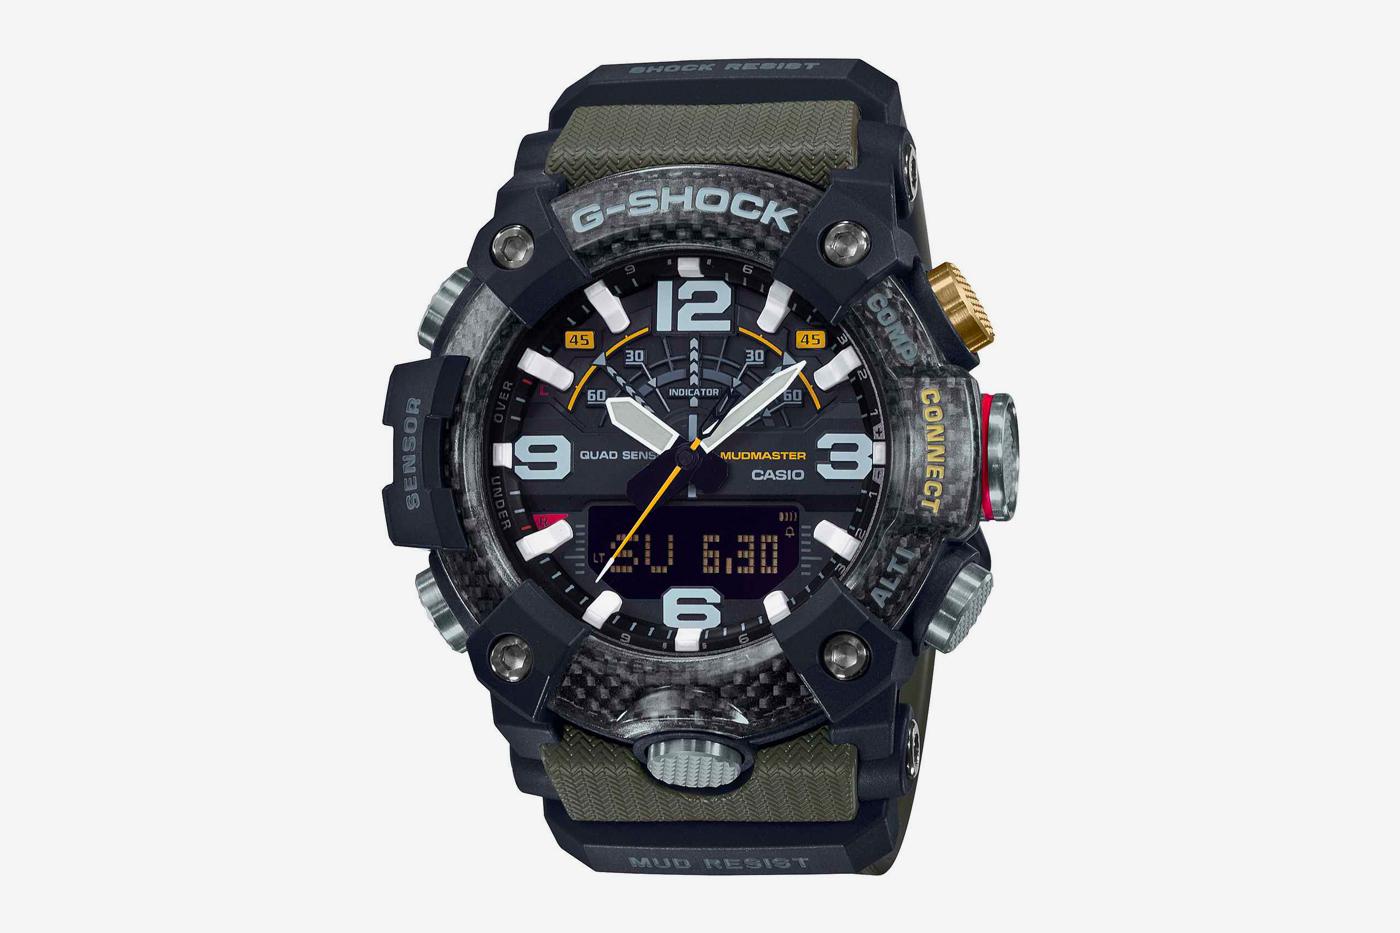 G-Shock Carbon 1